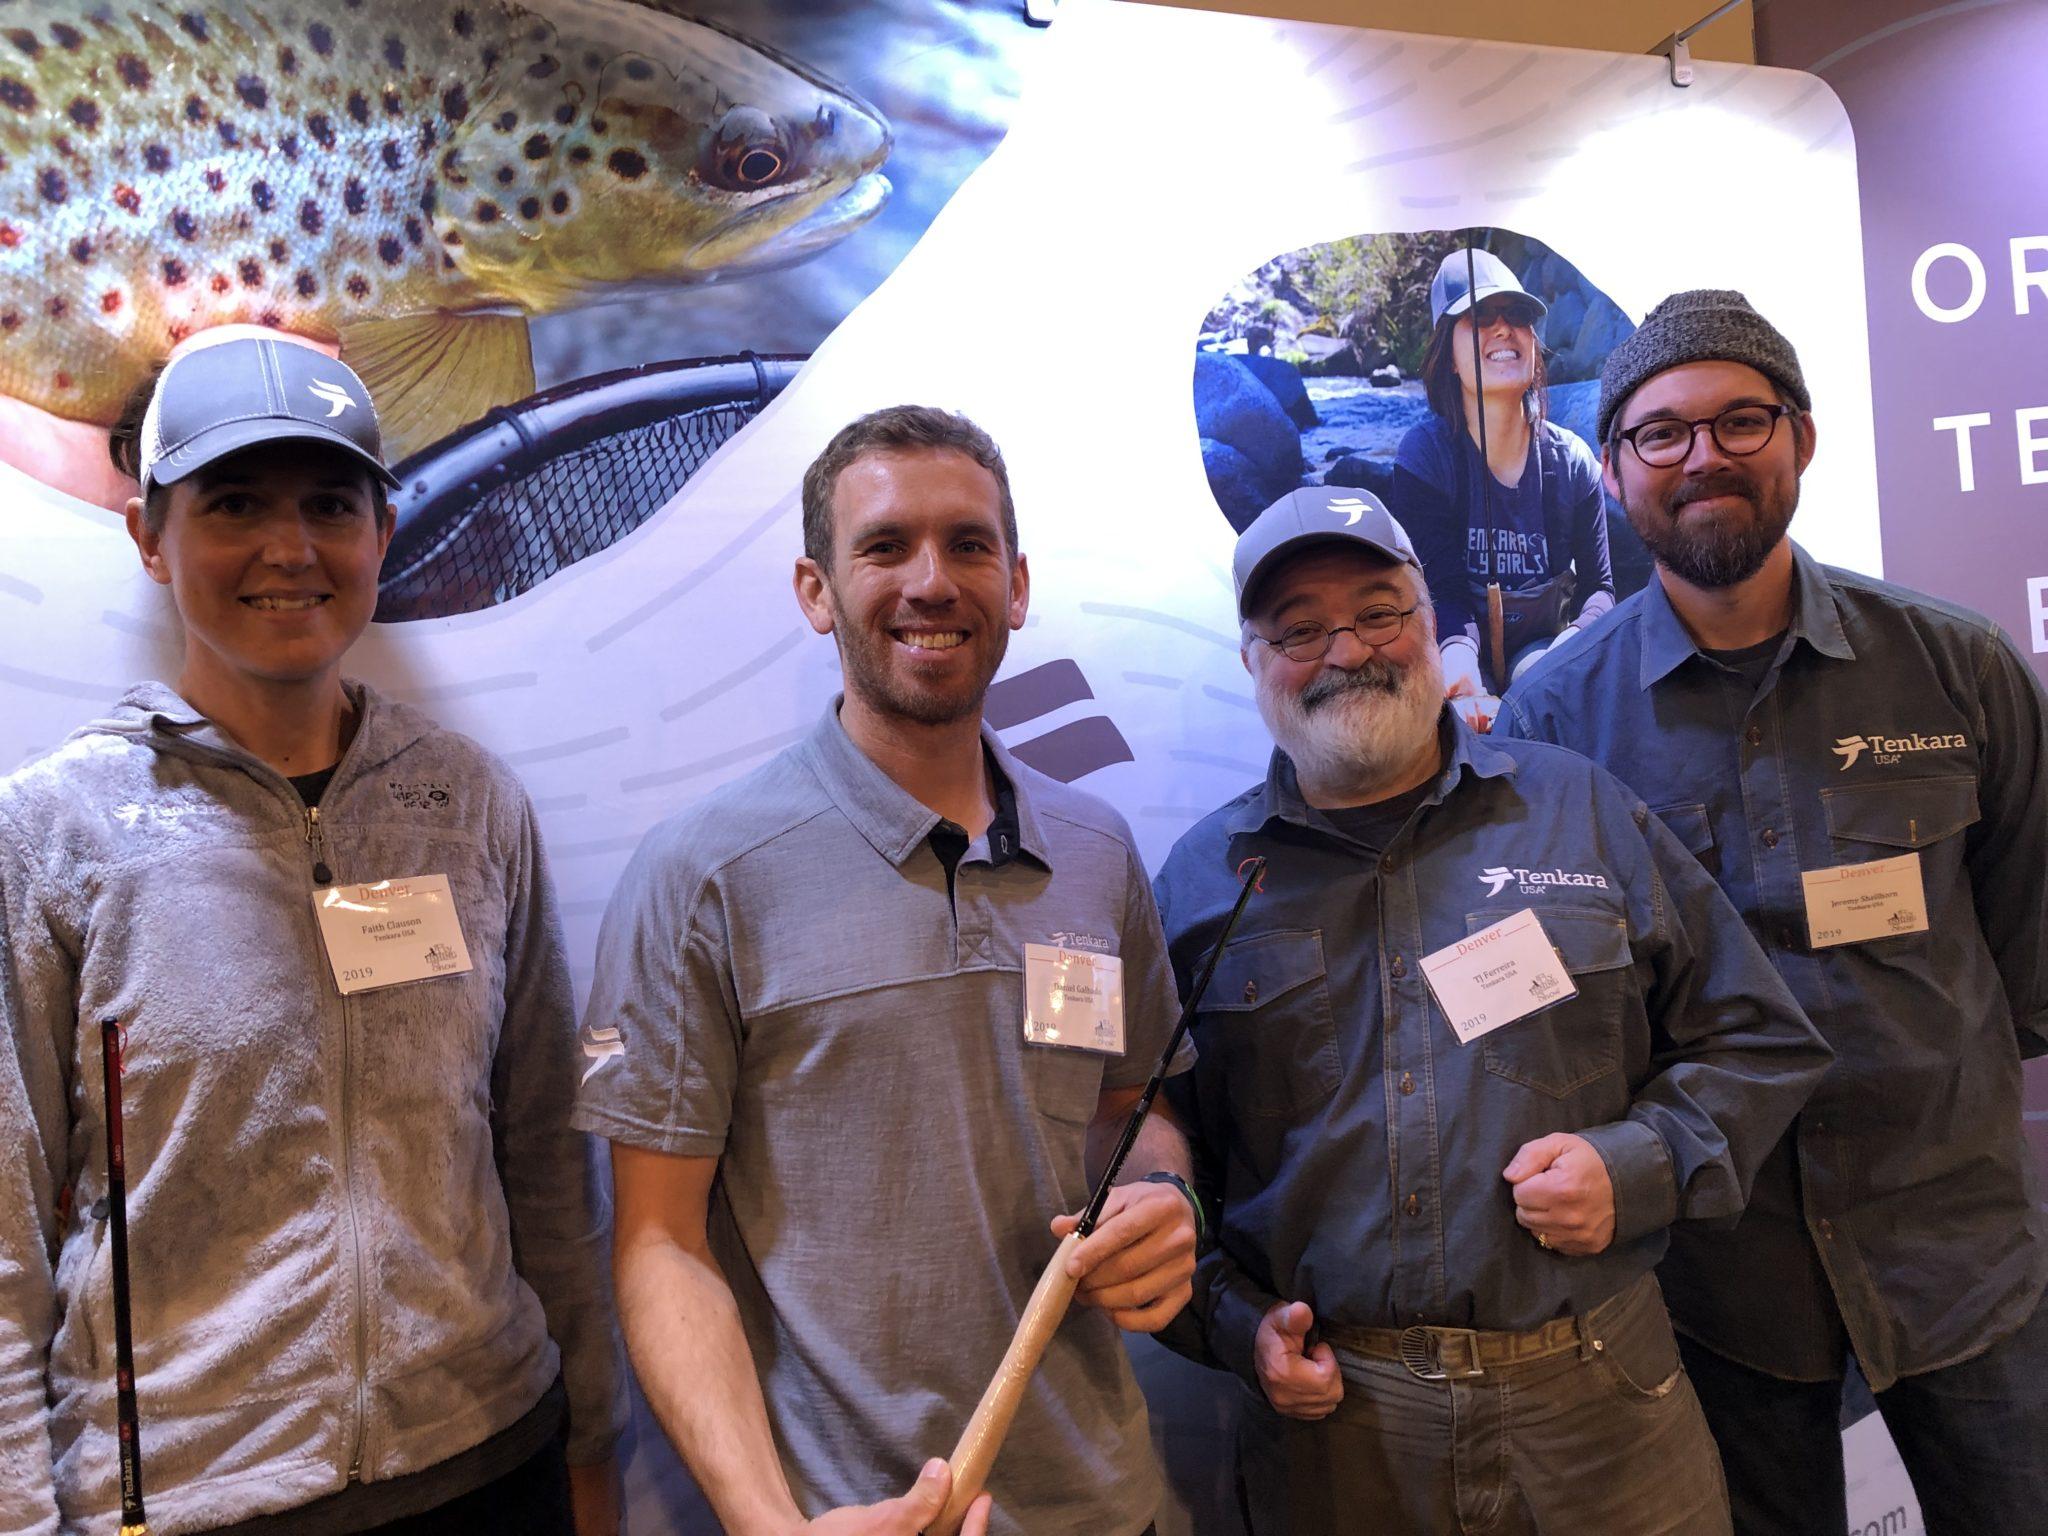 Tenkara USA at the Denver Fly Fishing Show